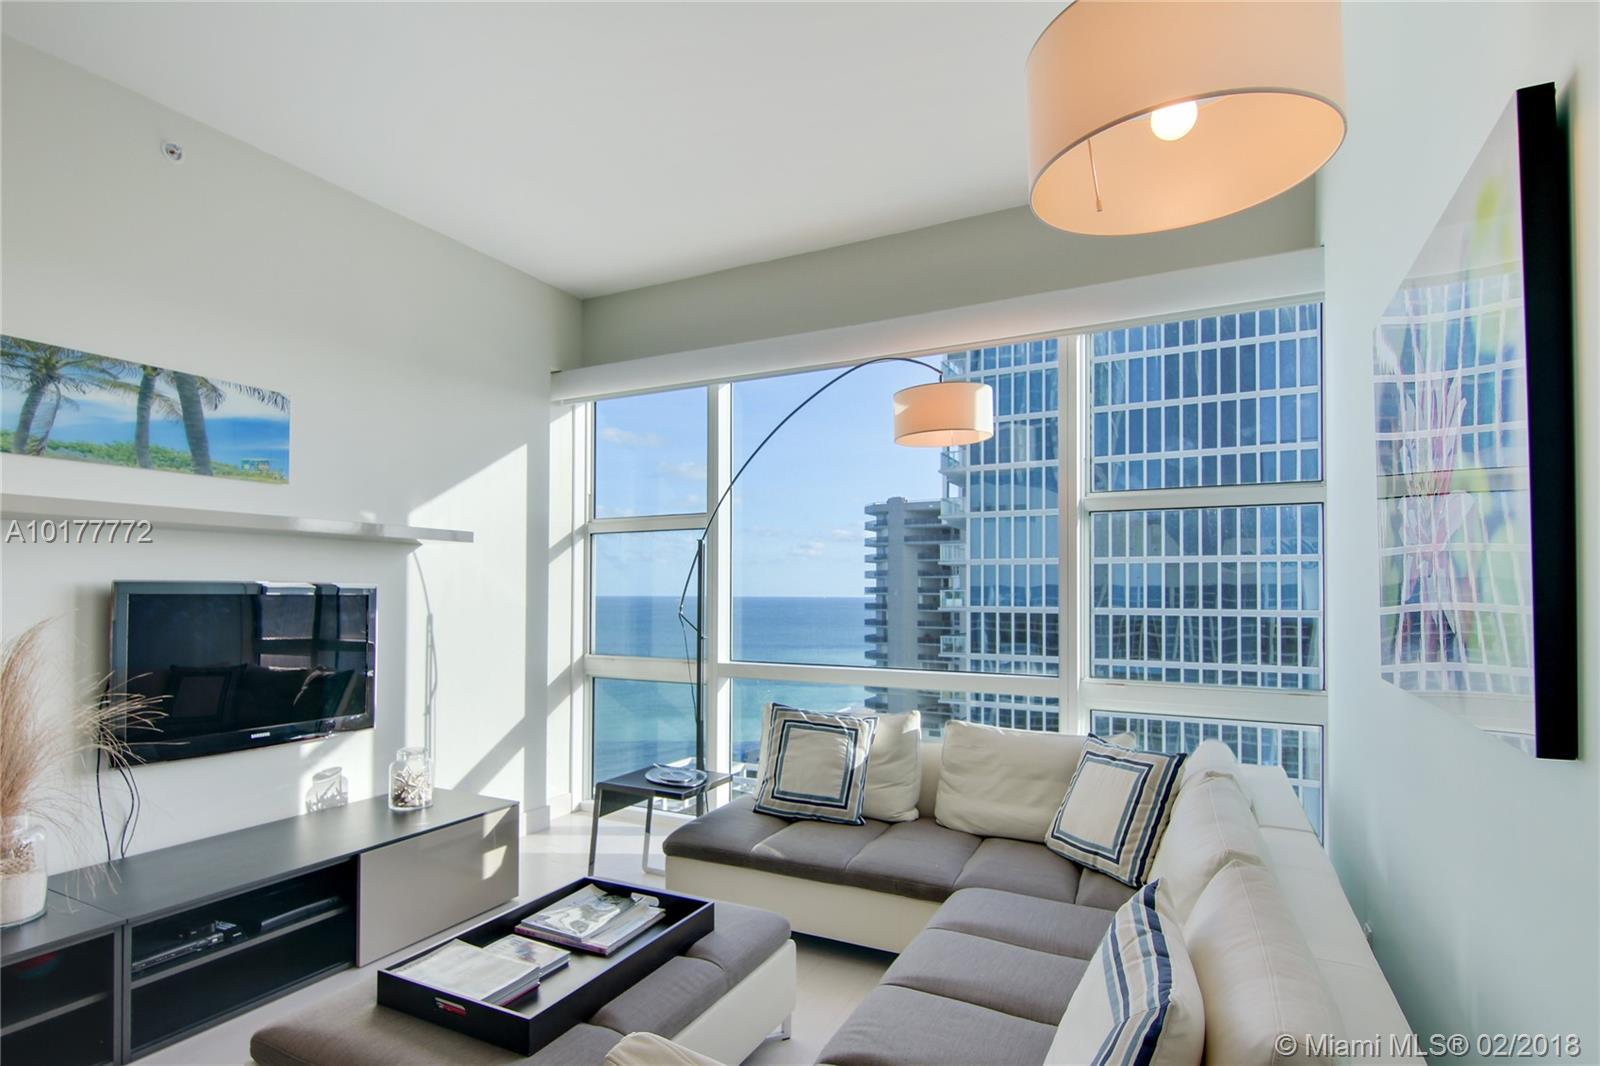 6801 Collins Ave, PH04 - Miami Beach, Florida